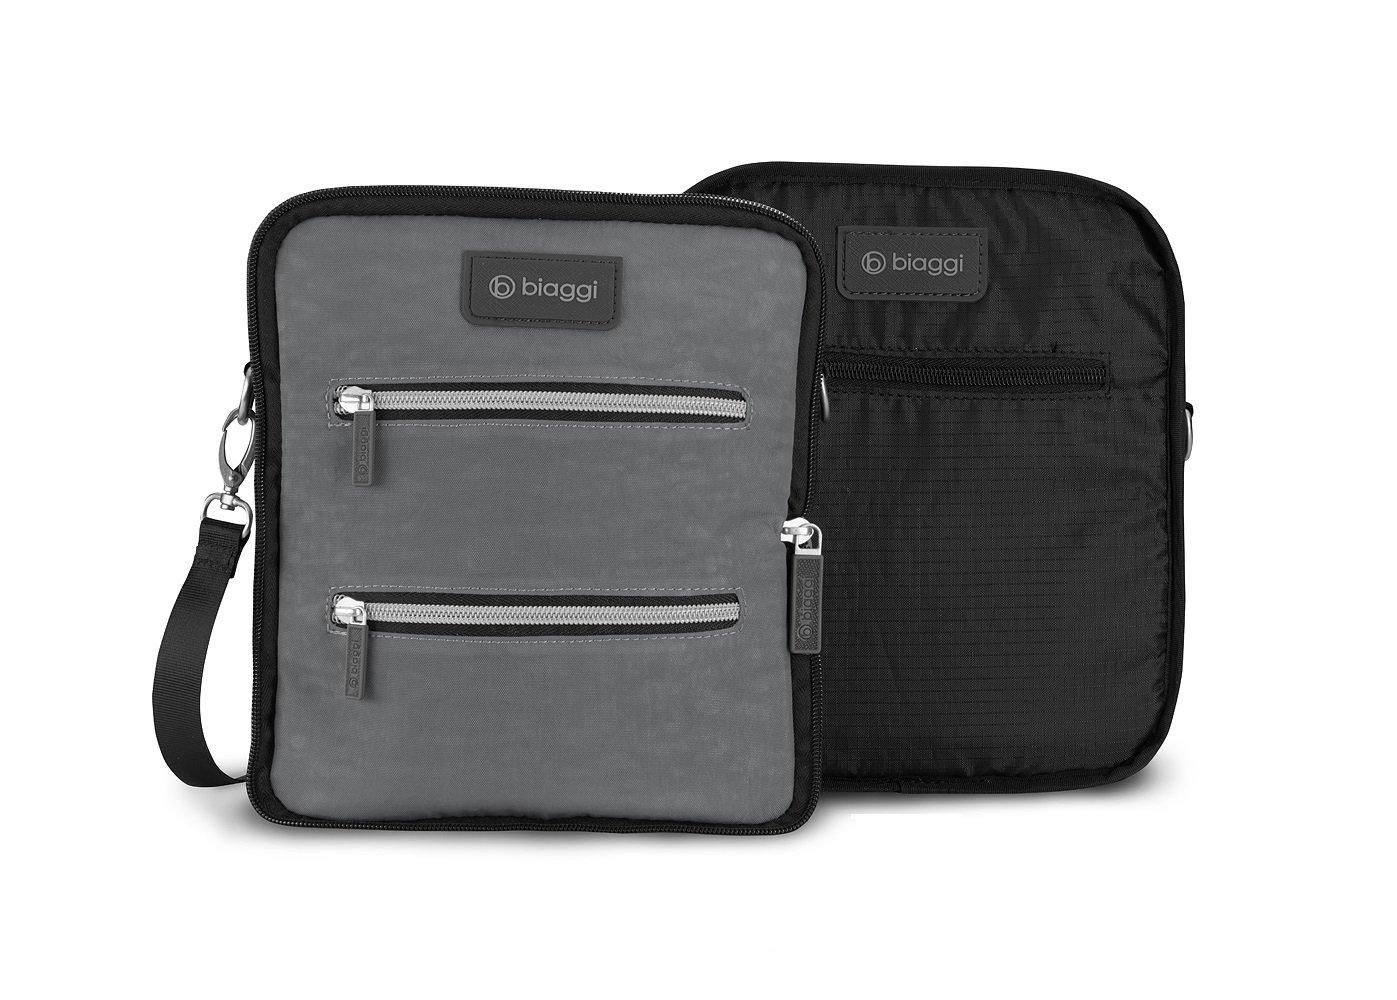 Biaggi Luggage Flippables Reversible Cross Body Bag by Biaggi Luggage